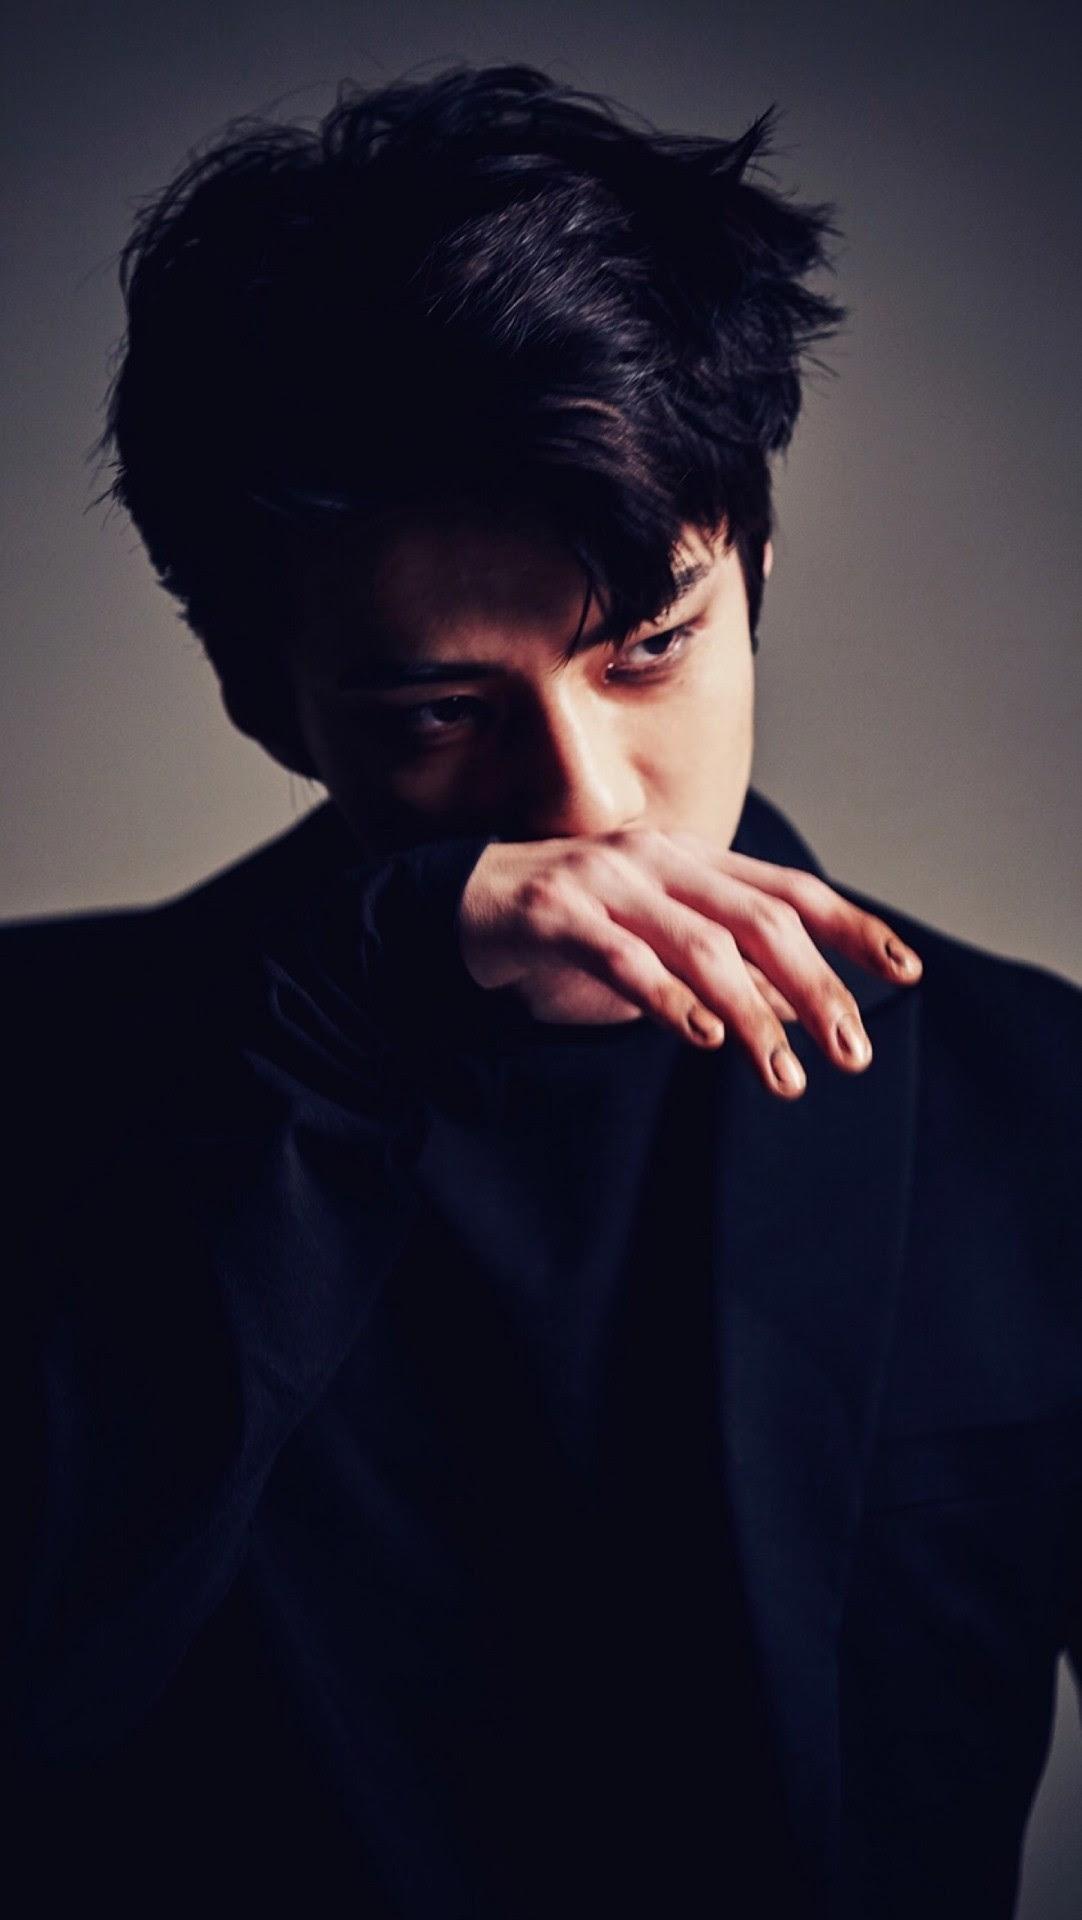 Exo Chanyeol Wallpaper